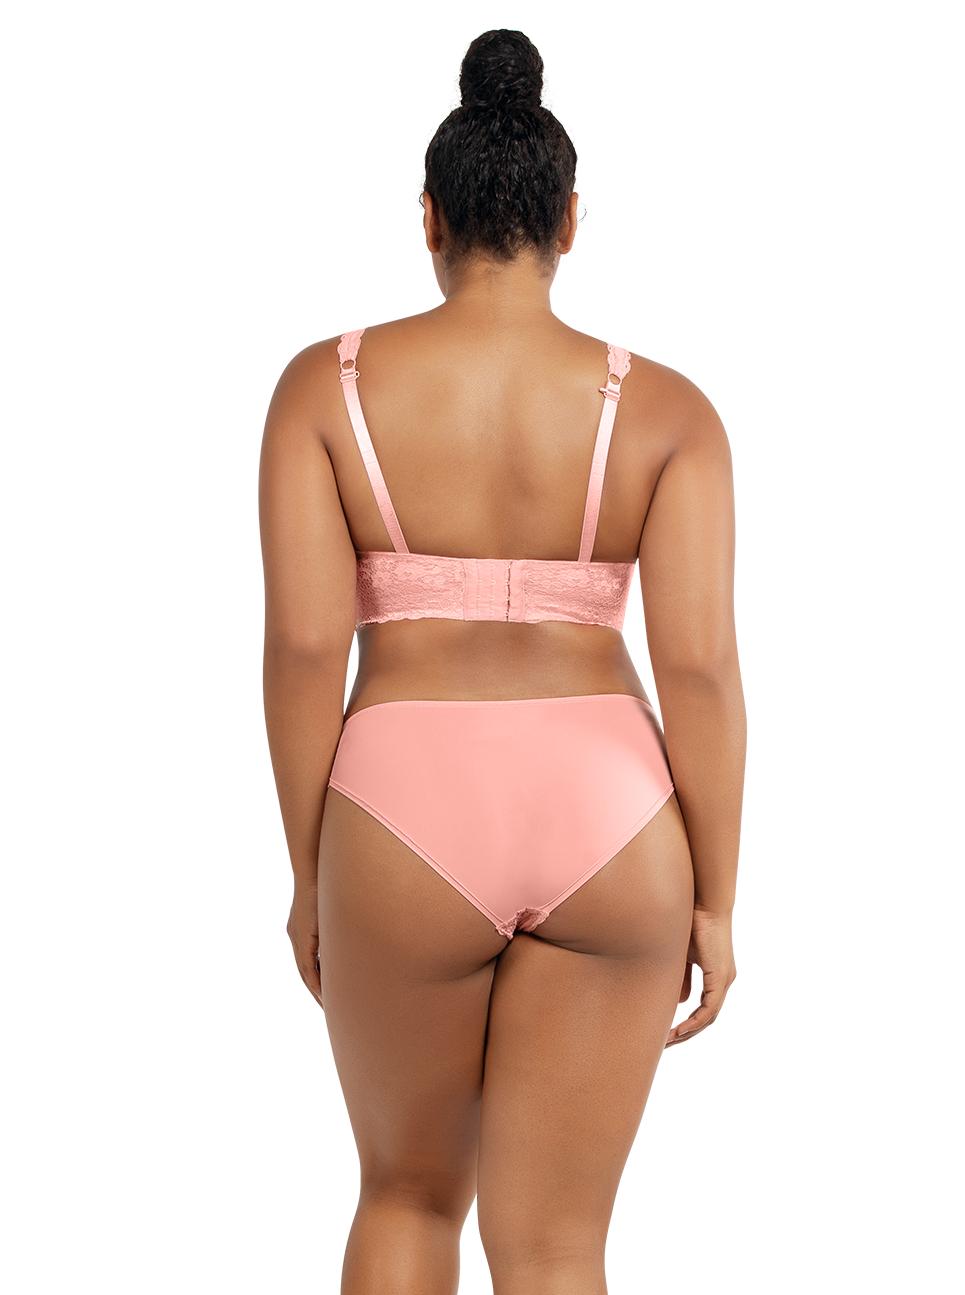 PARFAIT Adriana LaceBraletteP5482 BikiniP5483 PeachBud Back - Adriana Bikini - Peach Bud - P5483